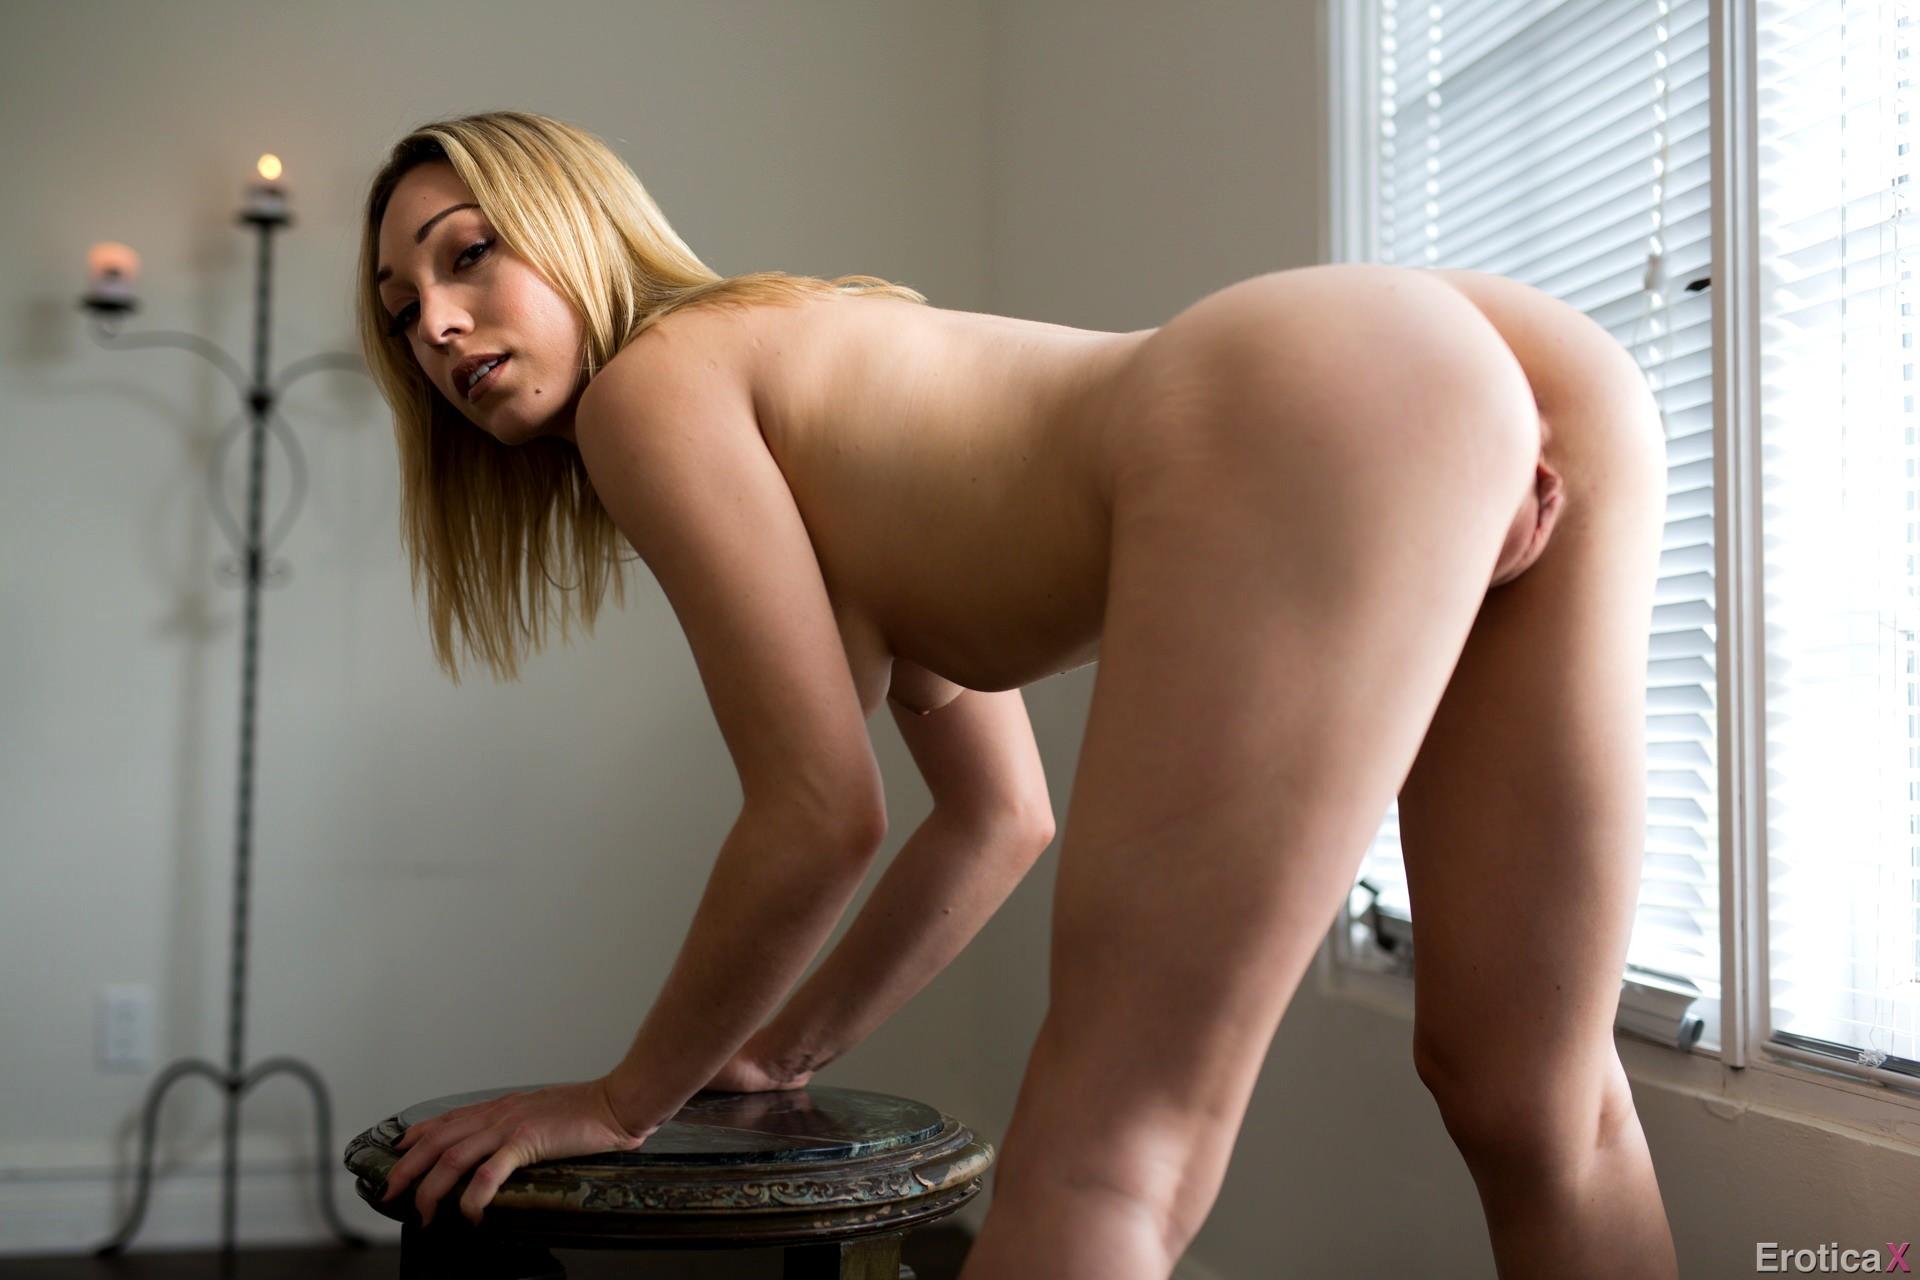 sunny leone giving blow job naked